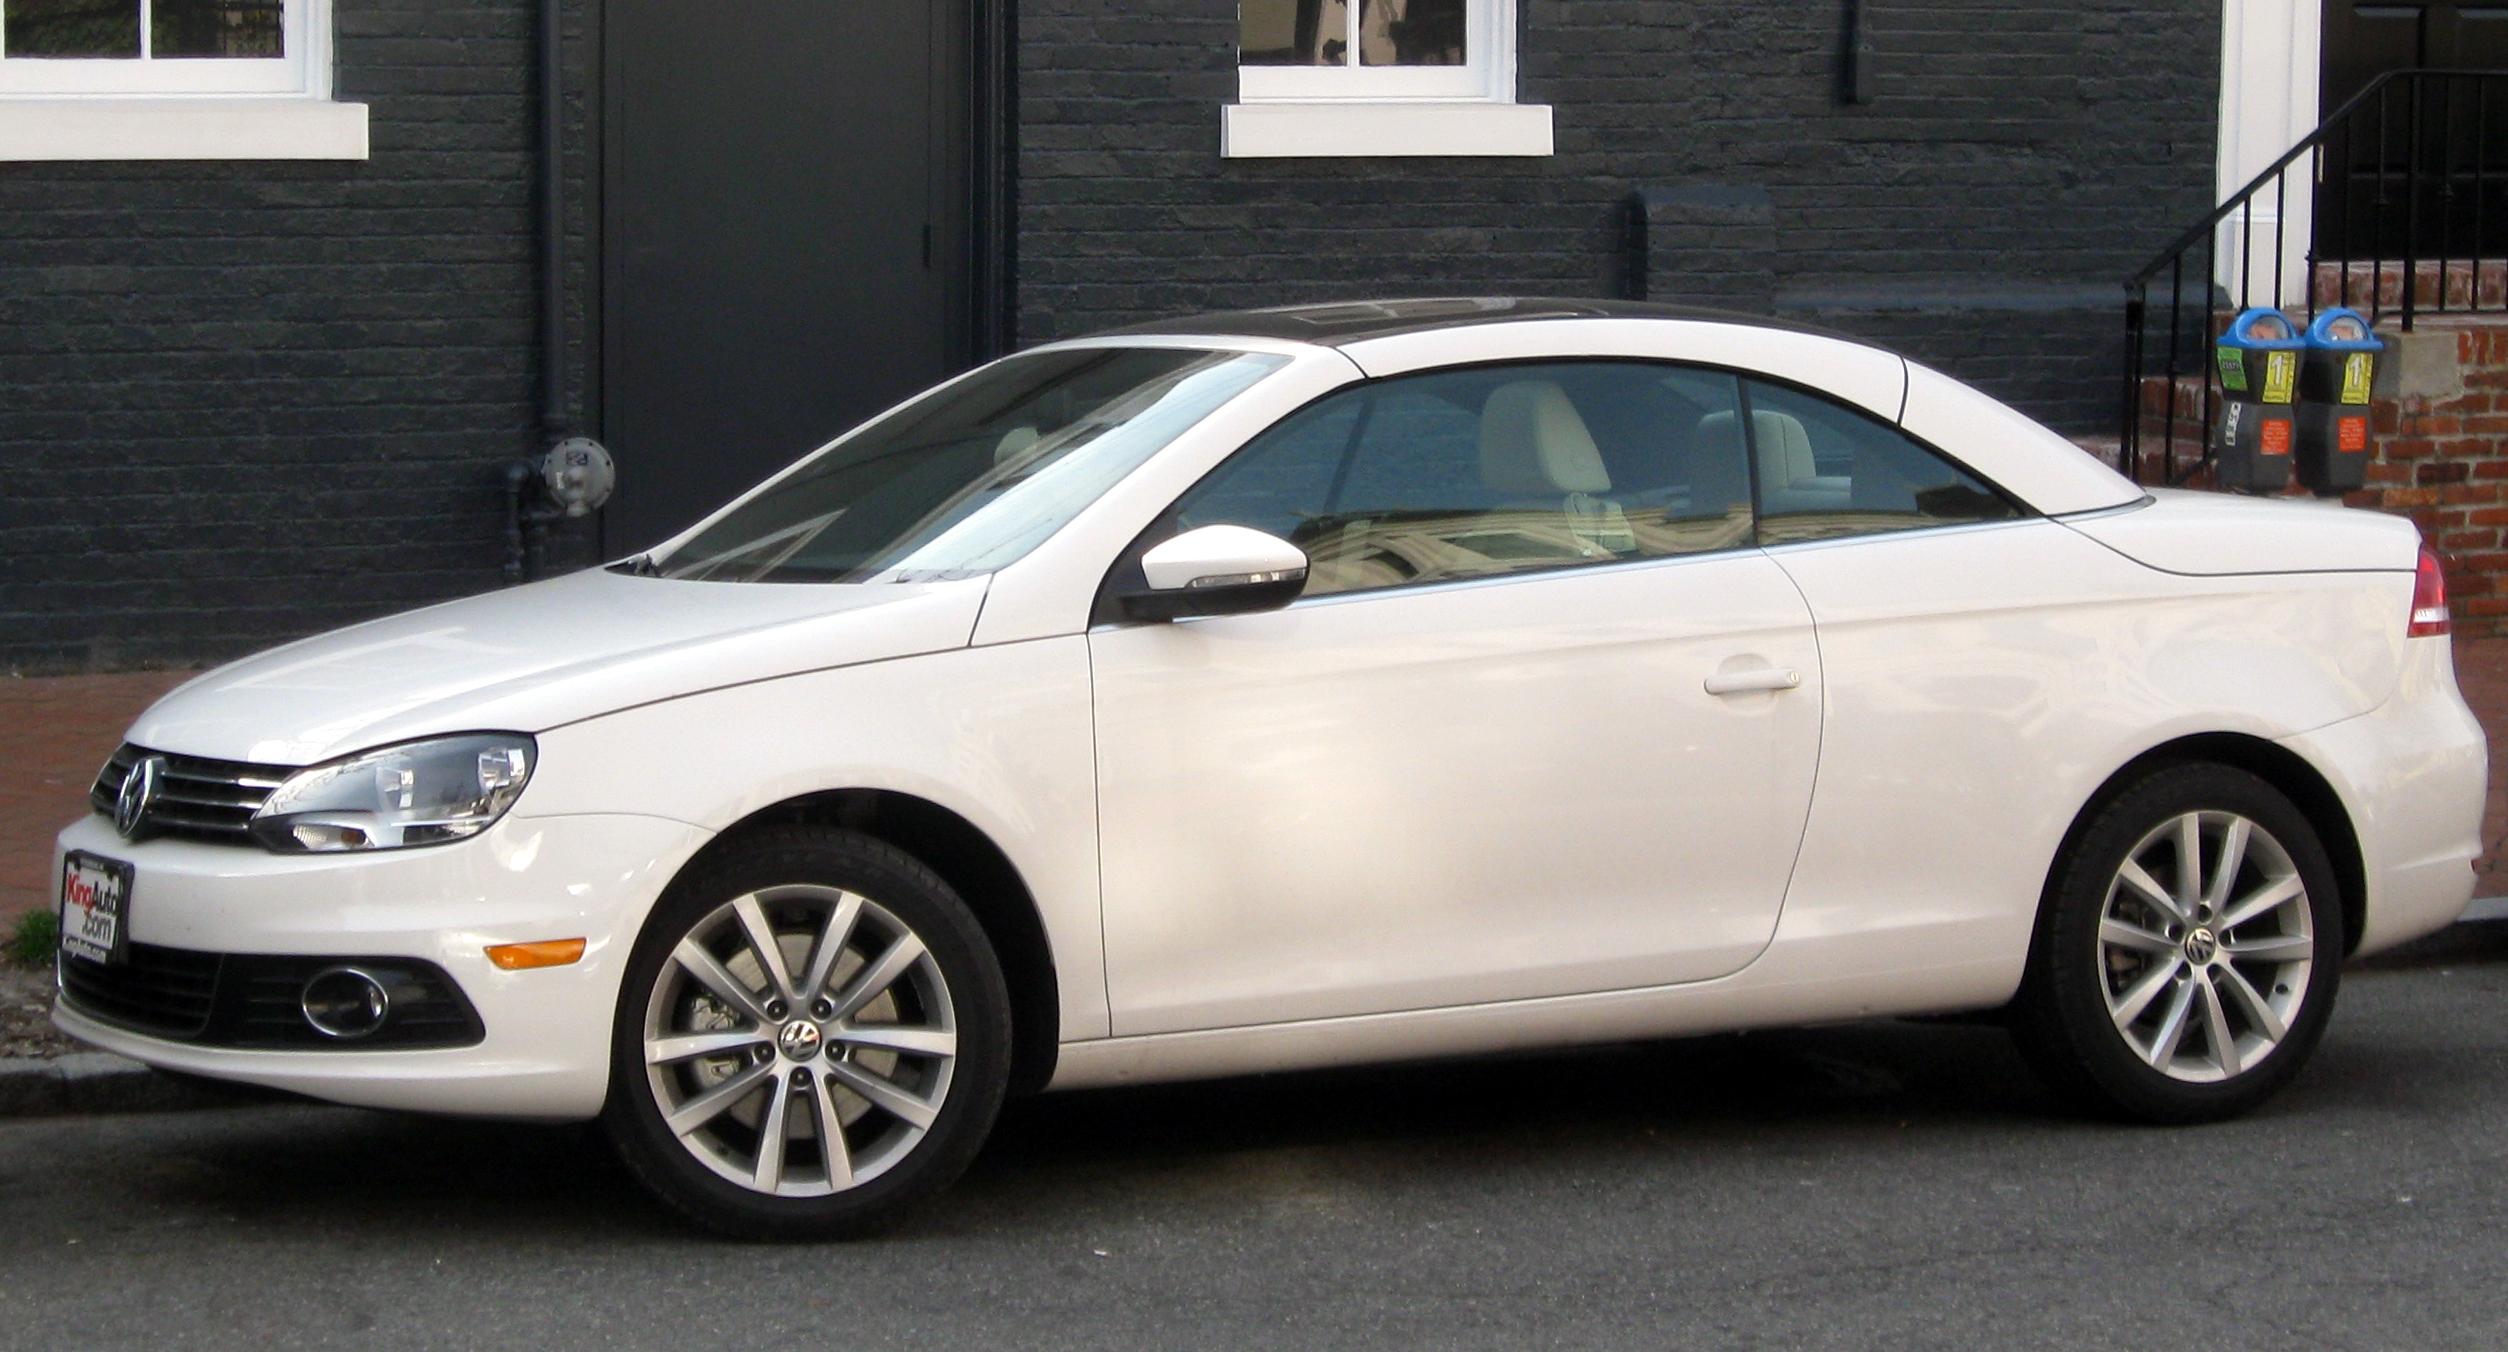 File:2012 Volkswagen Eos -- 01-08-2012.jpg